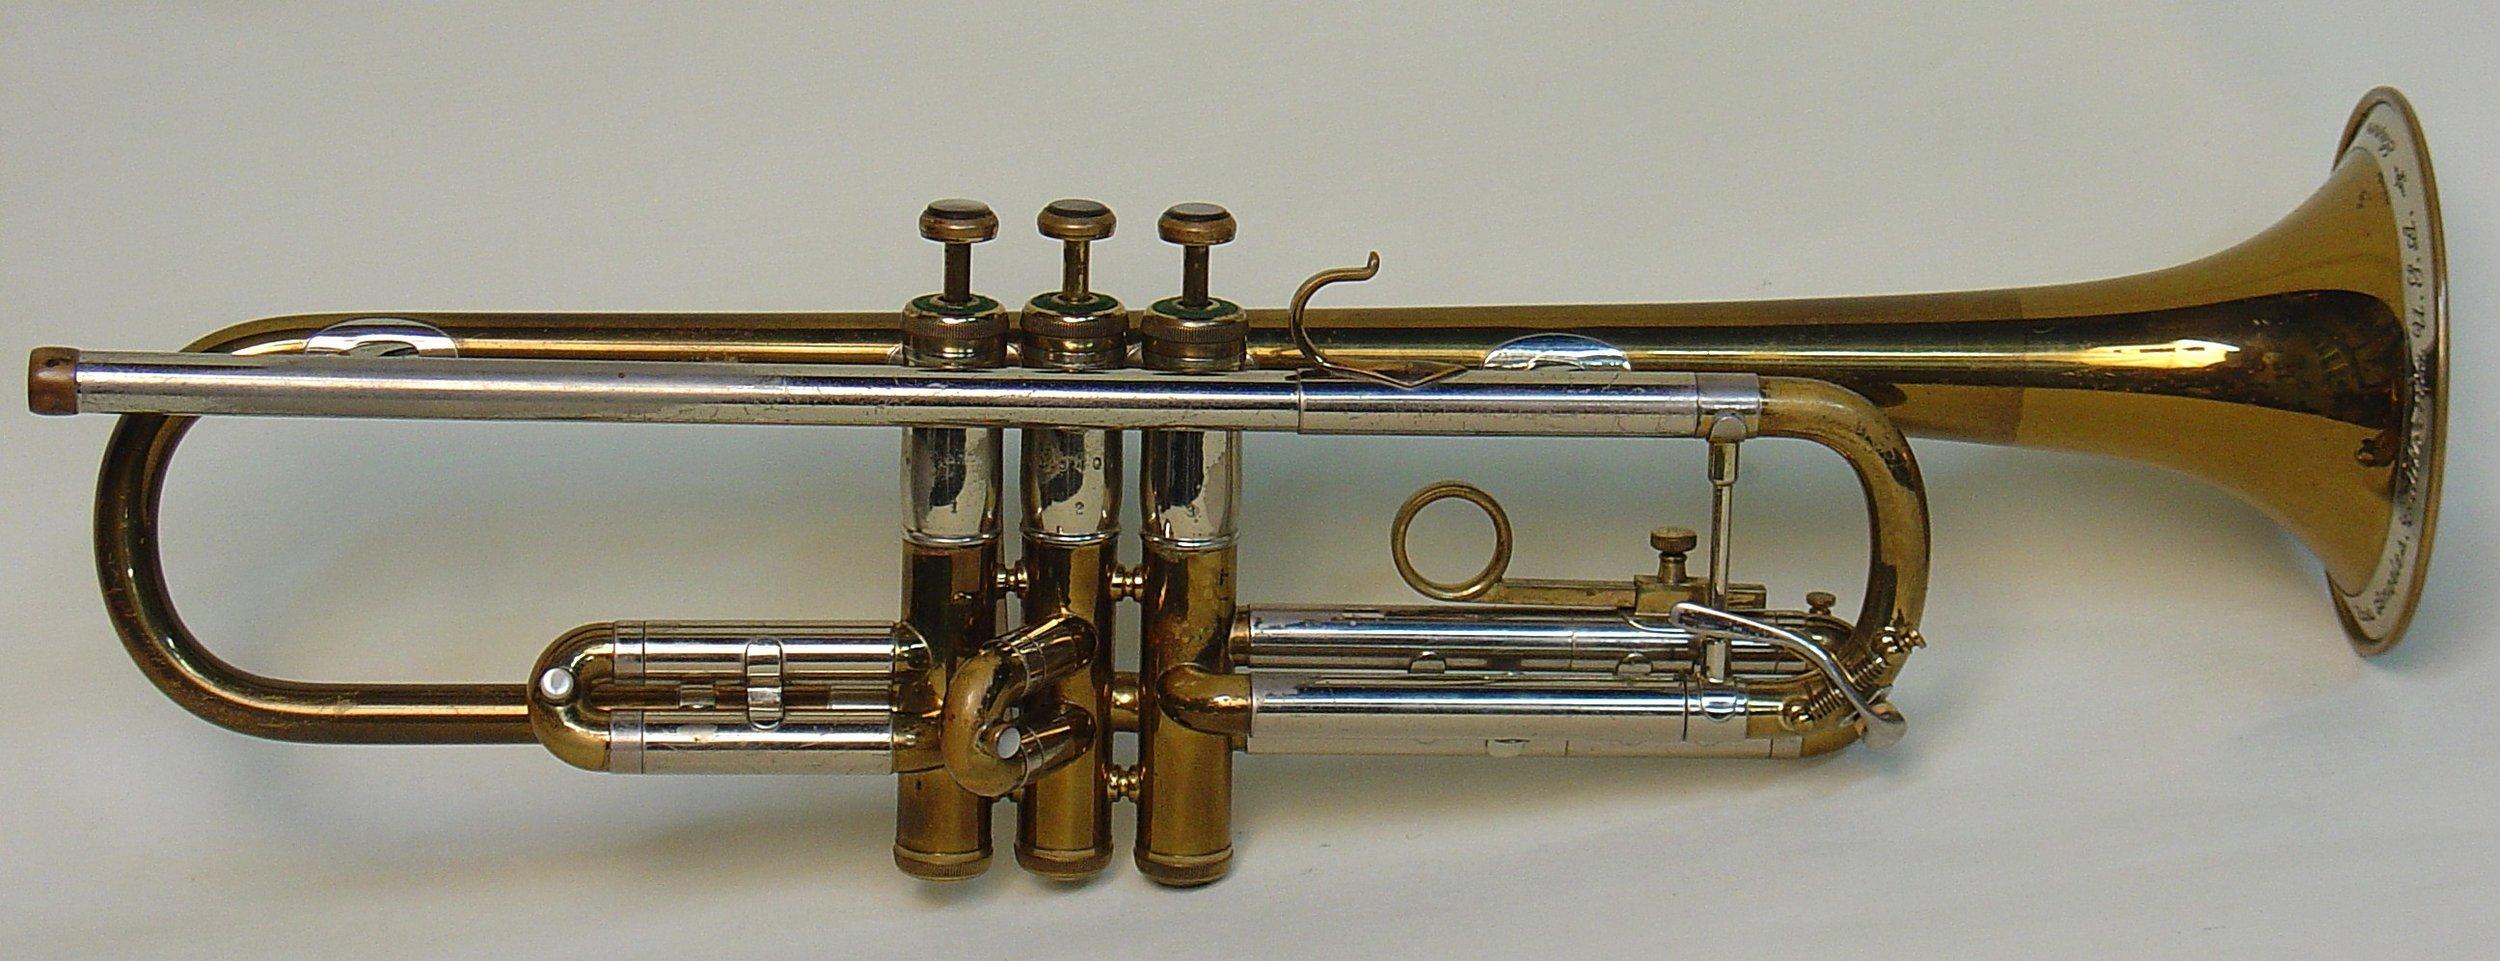 Recording Model Trumpets and Cornets